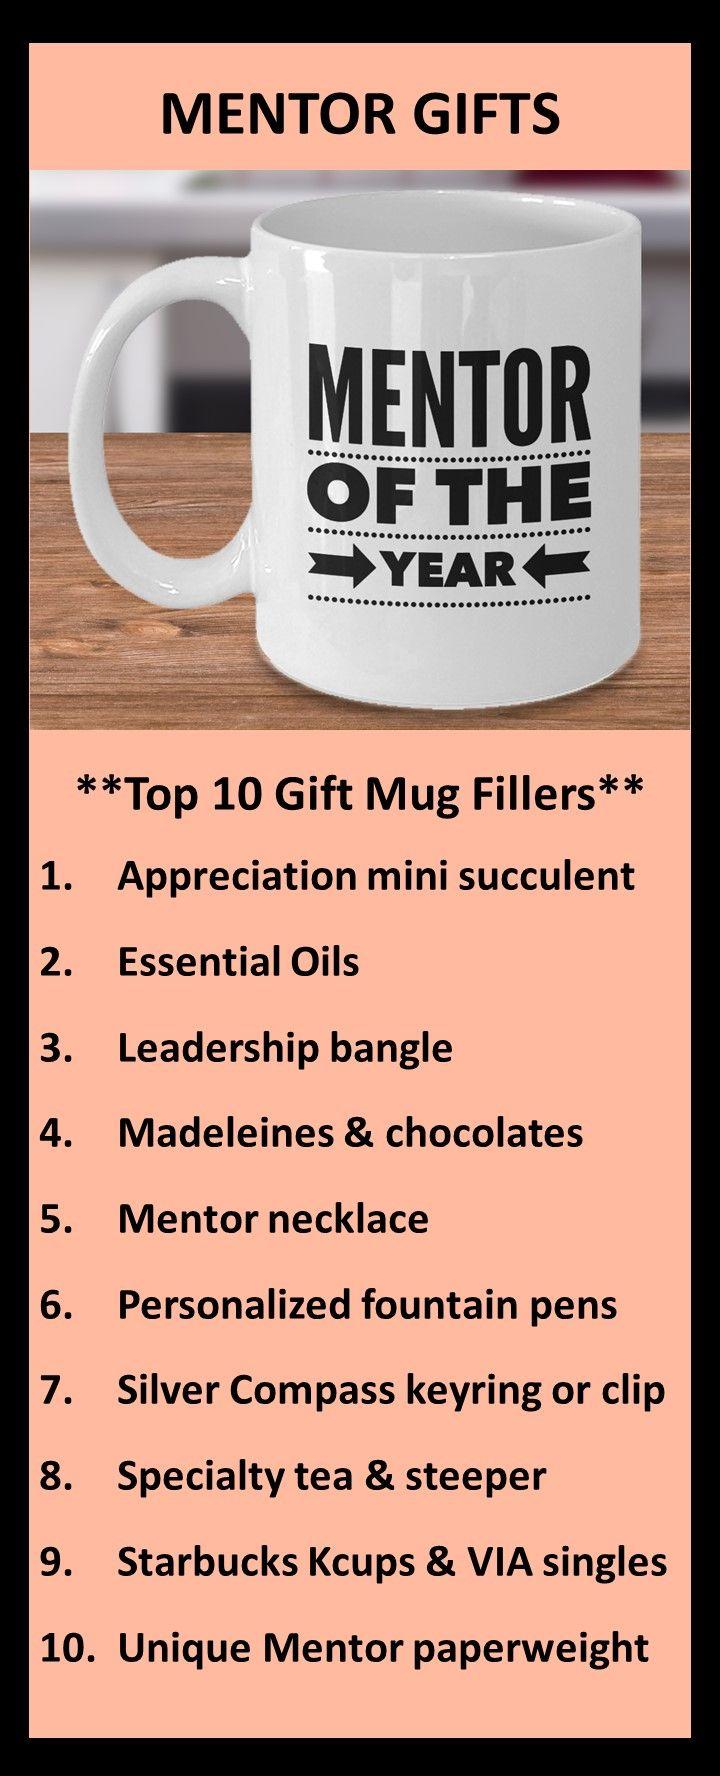 Mentor Gifts Mentor Of The Year Appreciation Birthday Christmas Gift Mug For Coffee Tea Gifts In A Mug Mugs Mom Birthday Gift